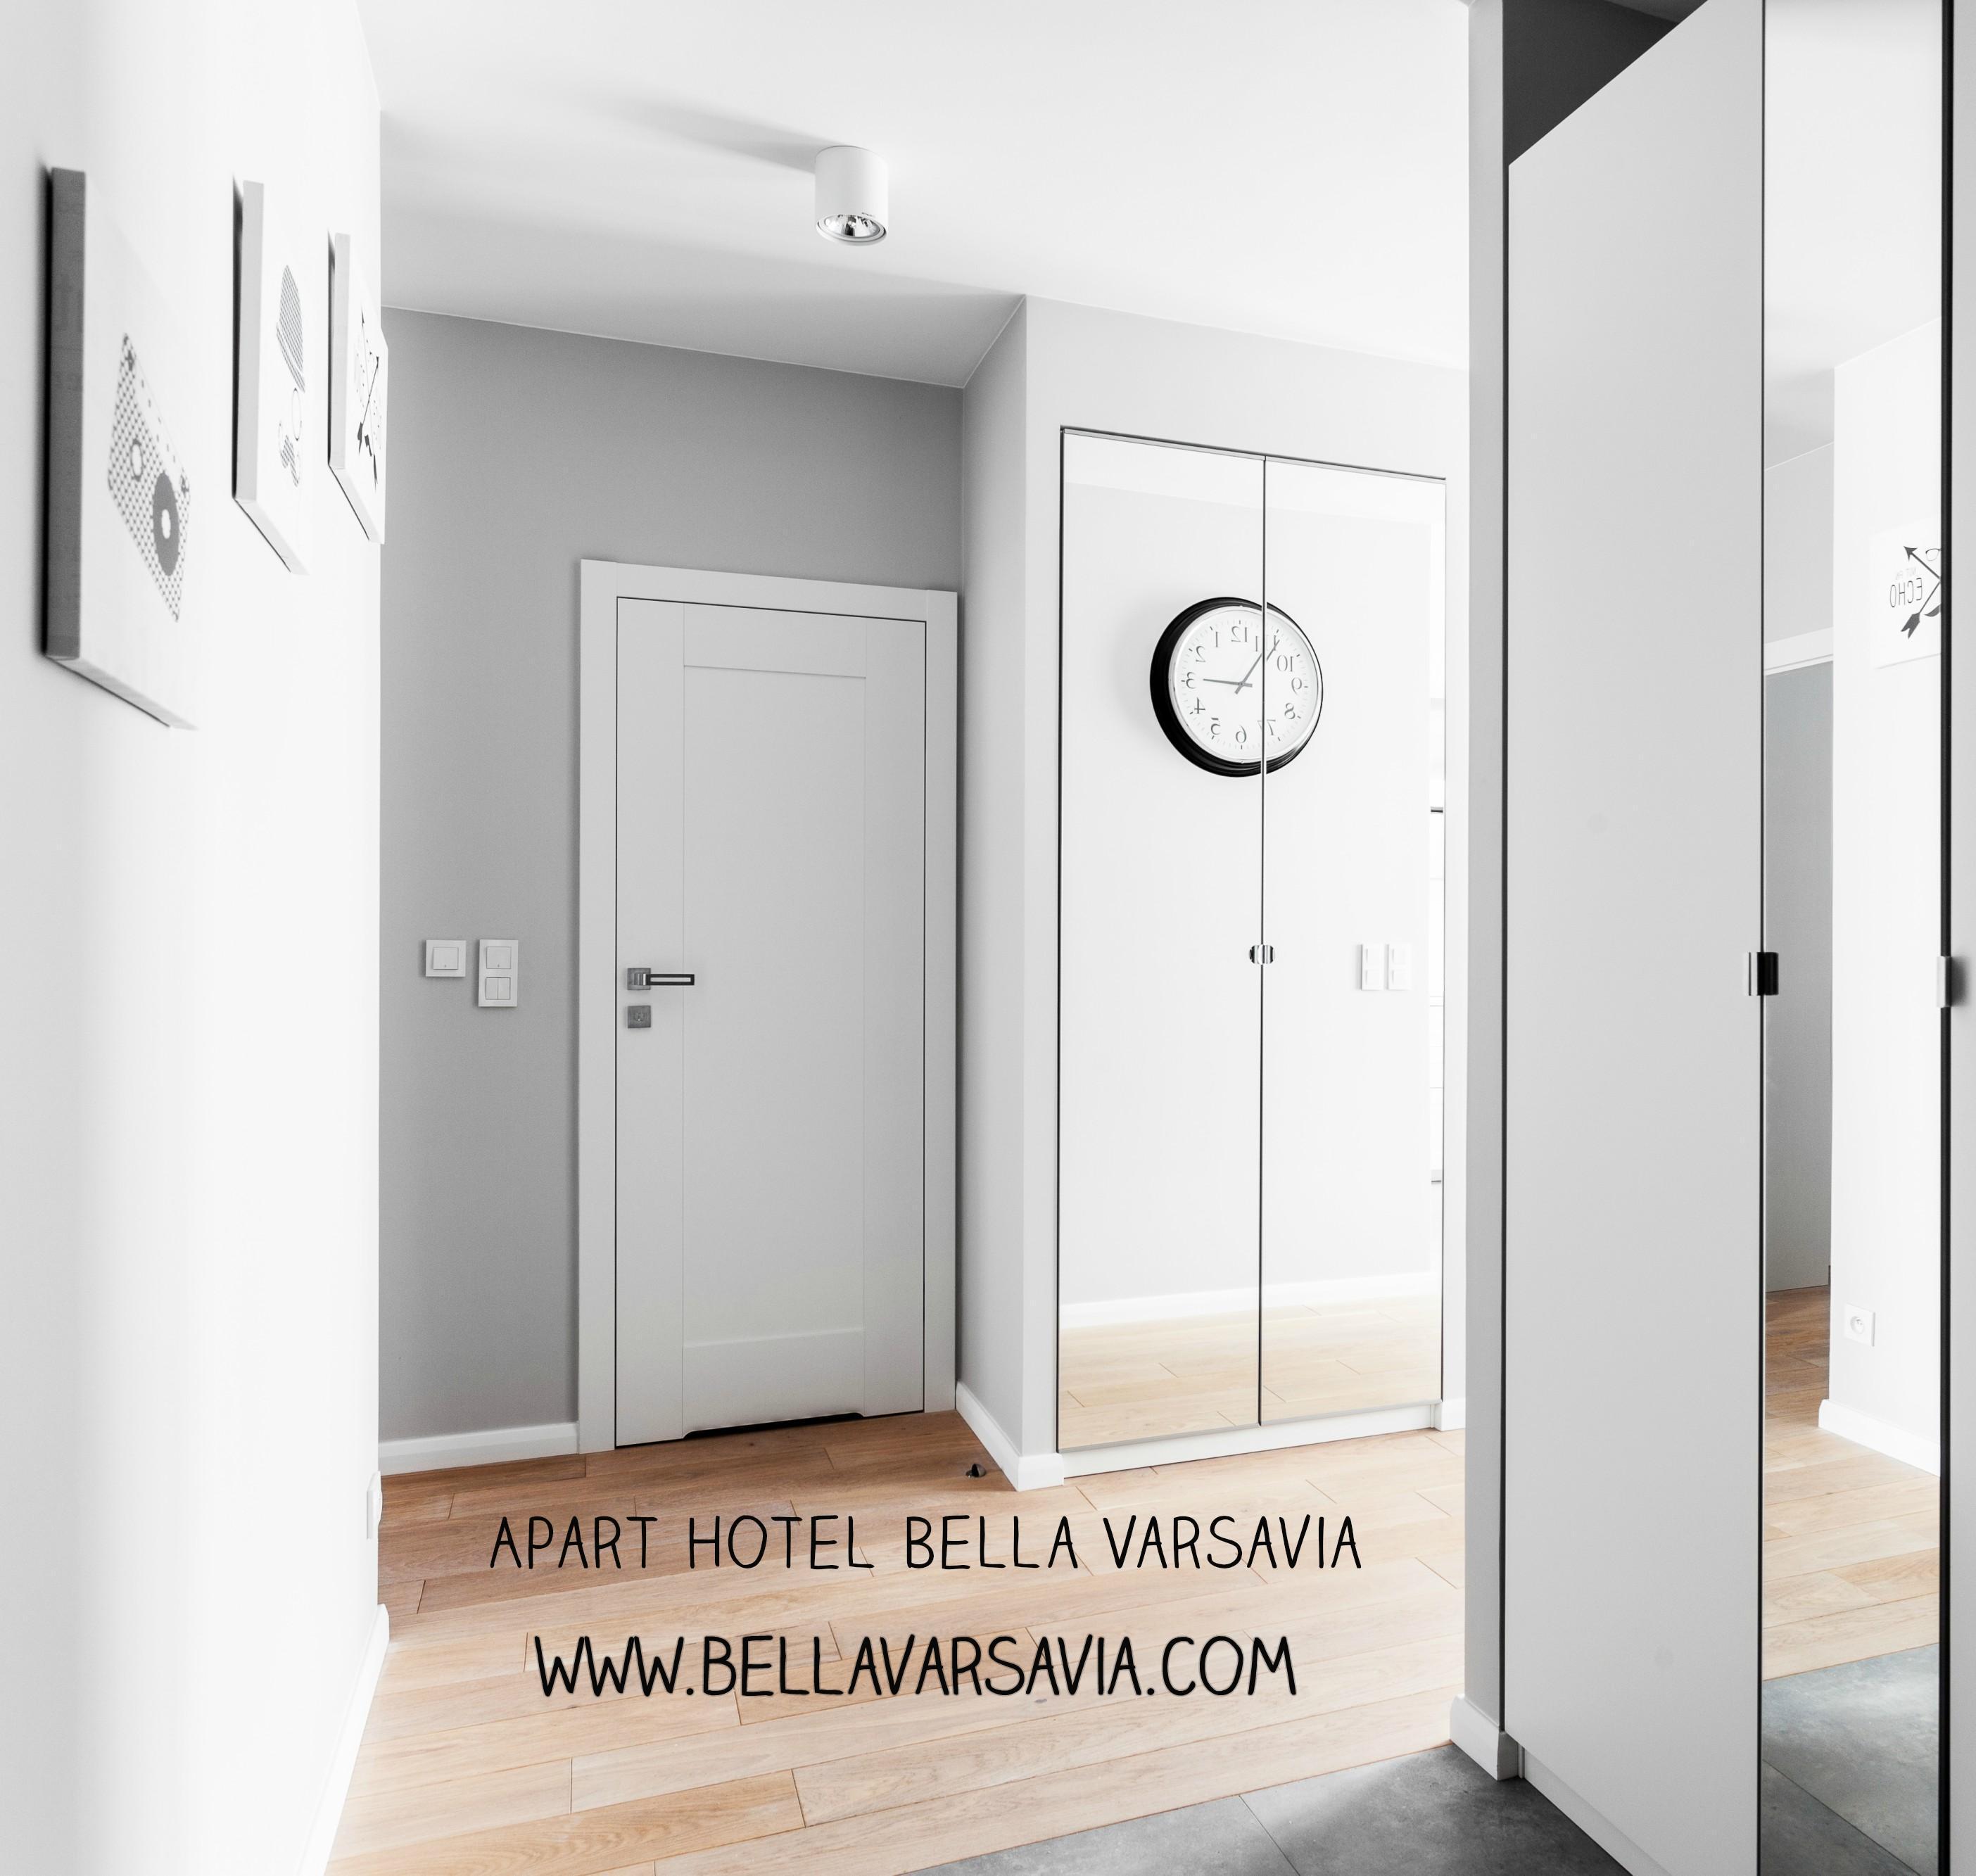 aparthotelbellavarsavia